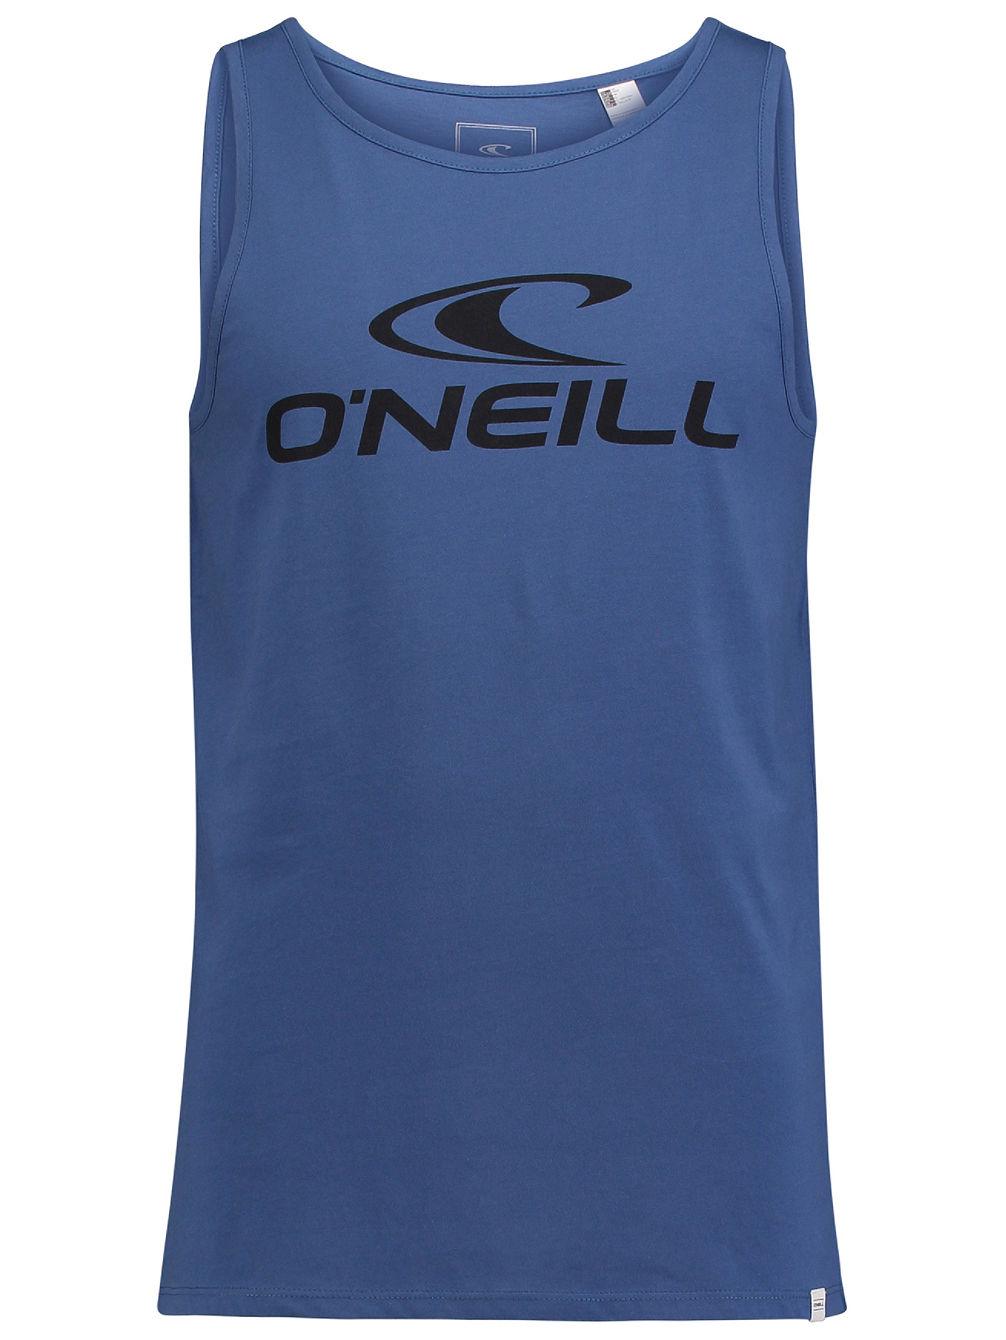 o-neill-tank-top